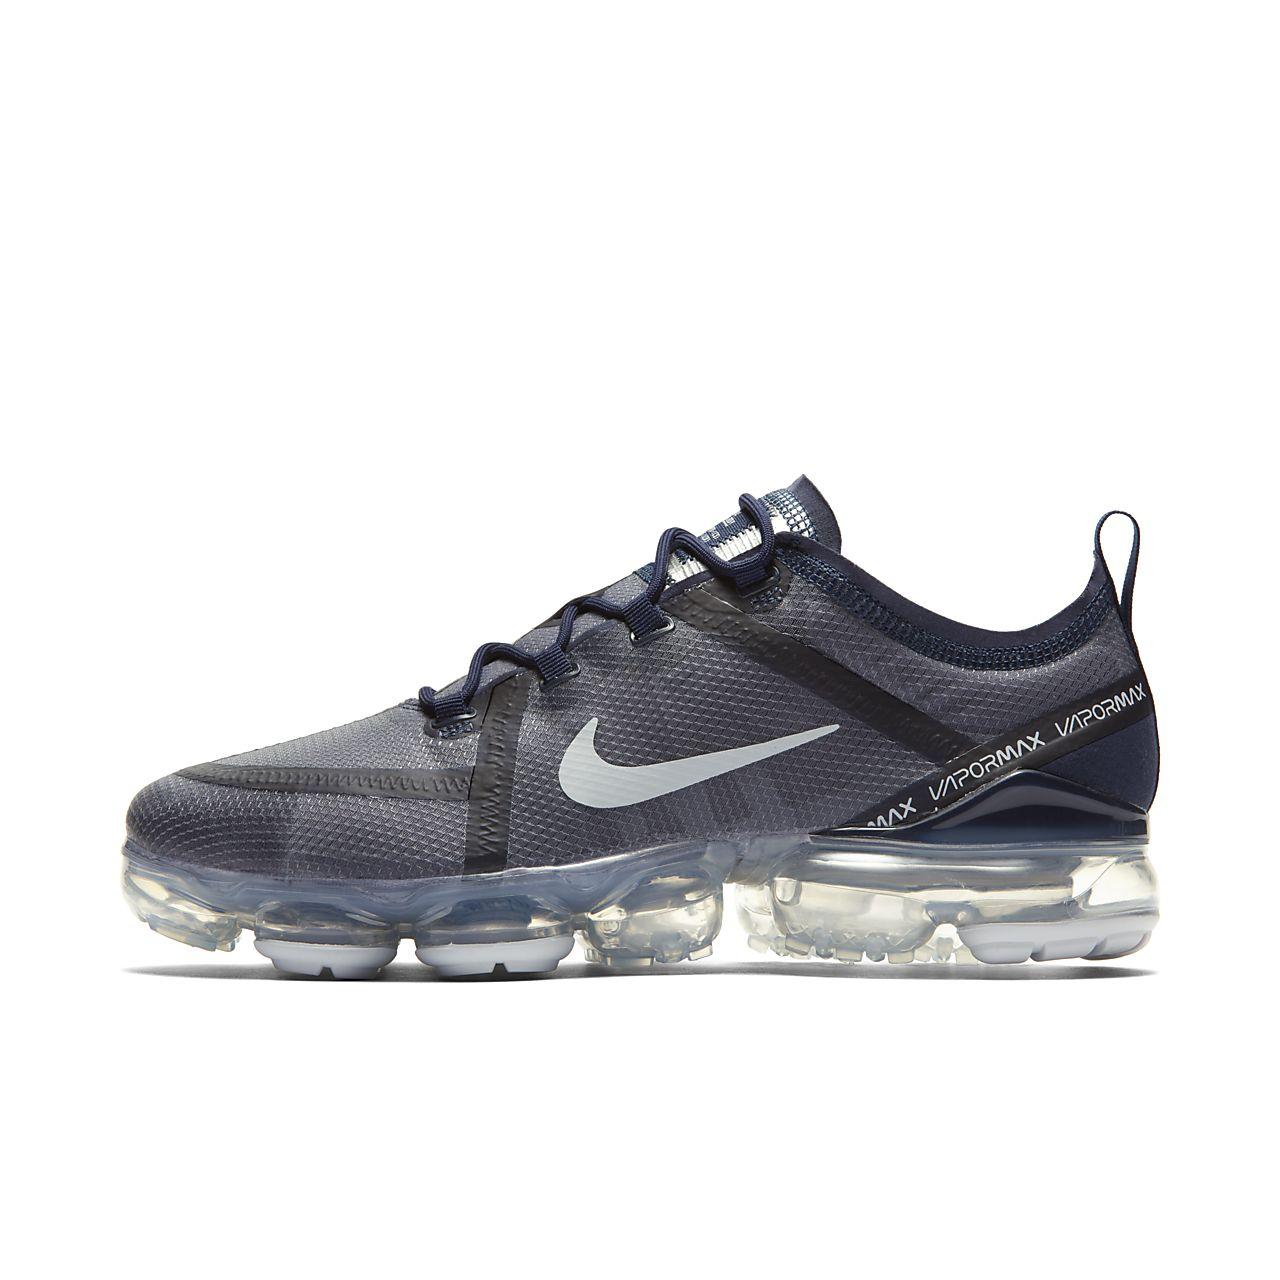 Nike Air Max 97 Obsidian Schuhe für Herren Outlet Austria